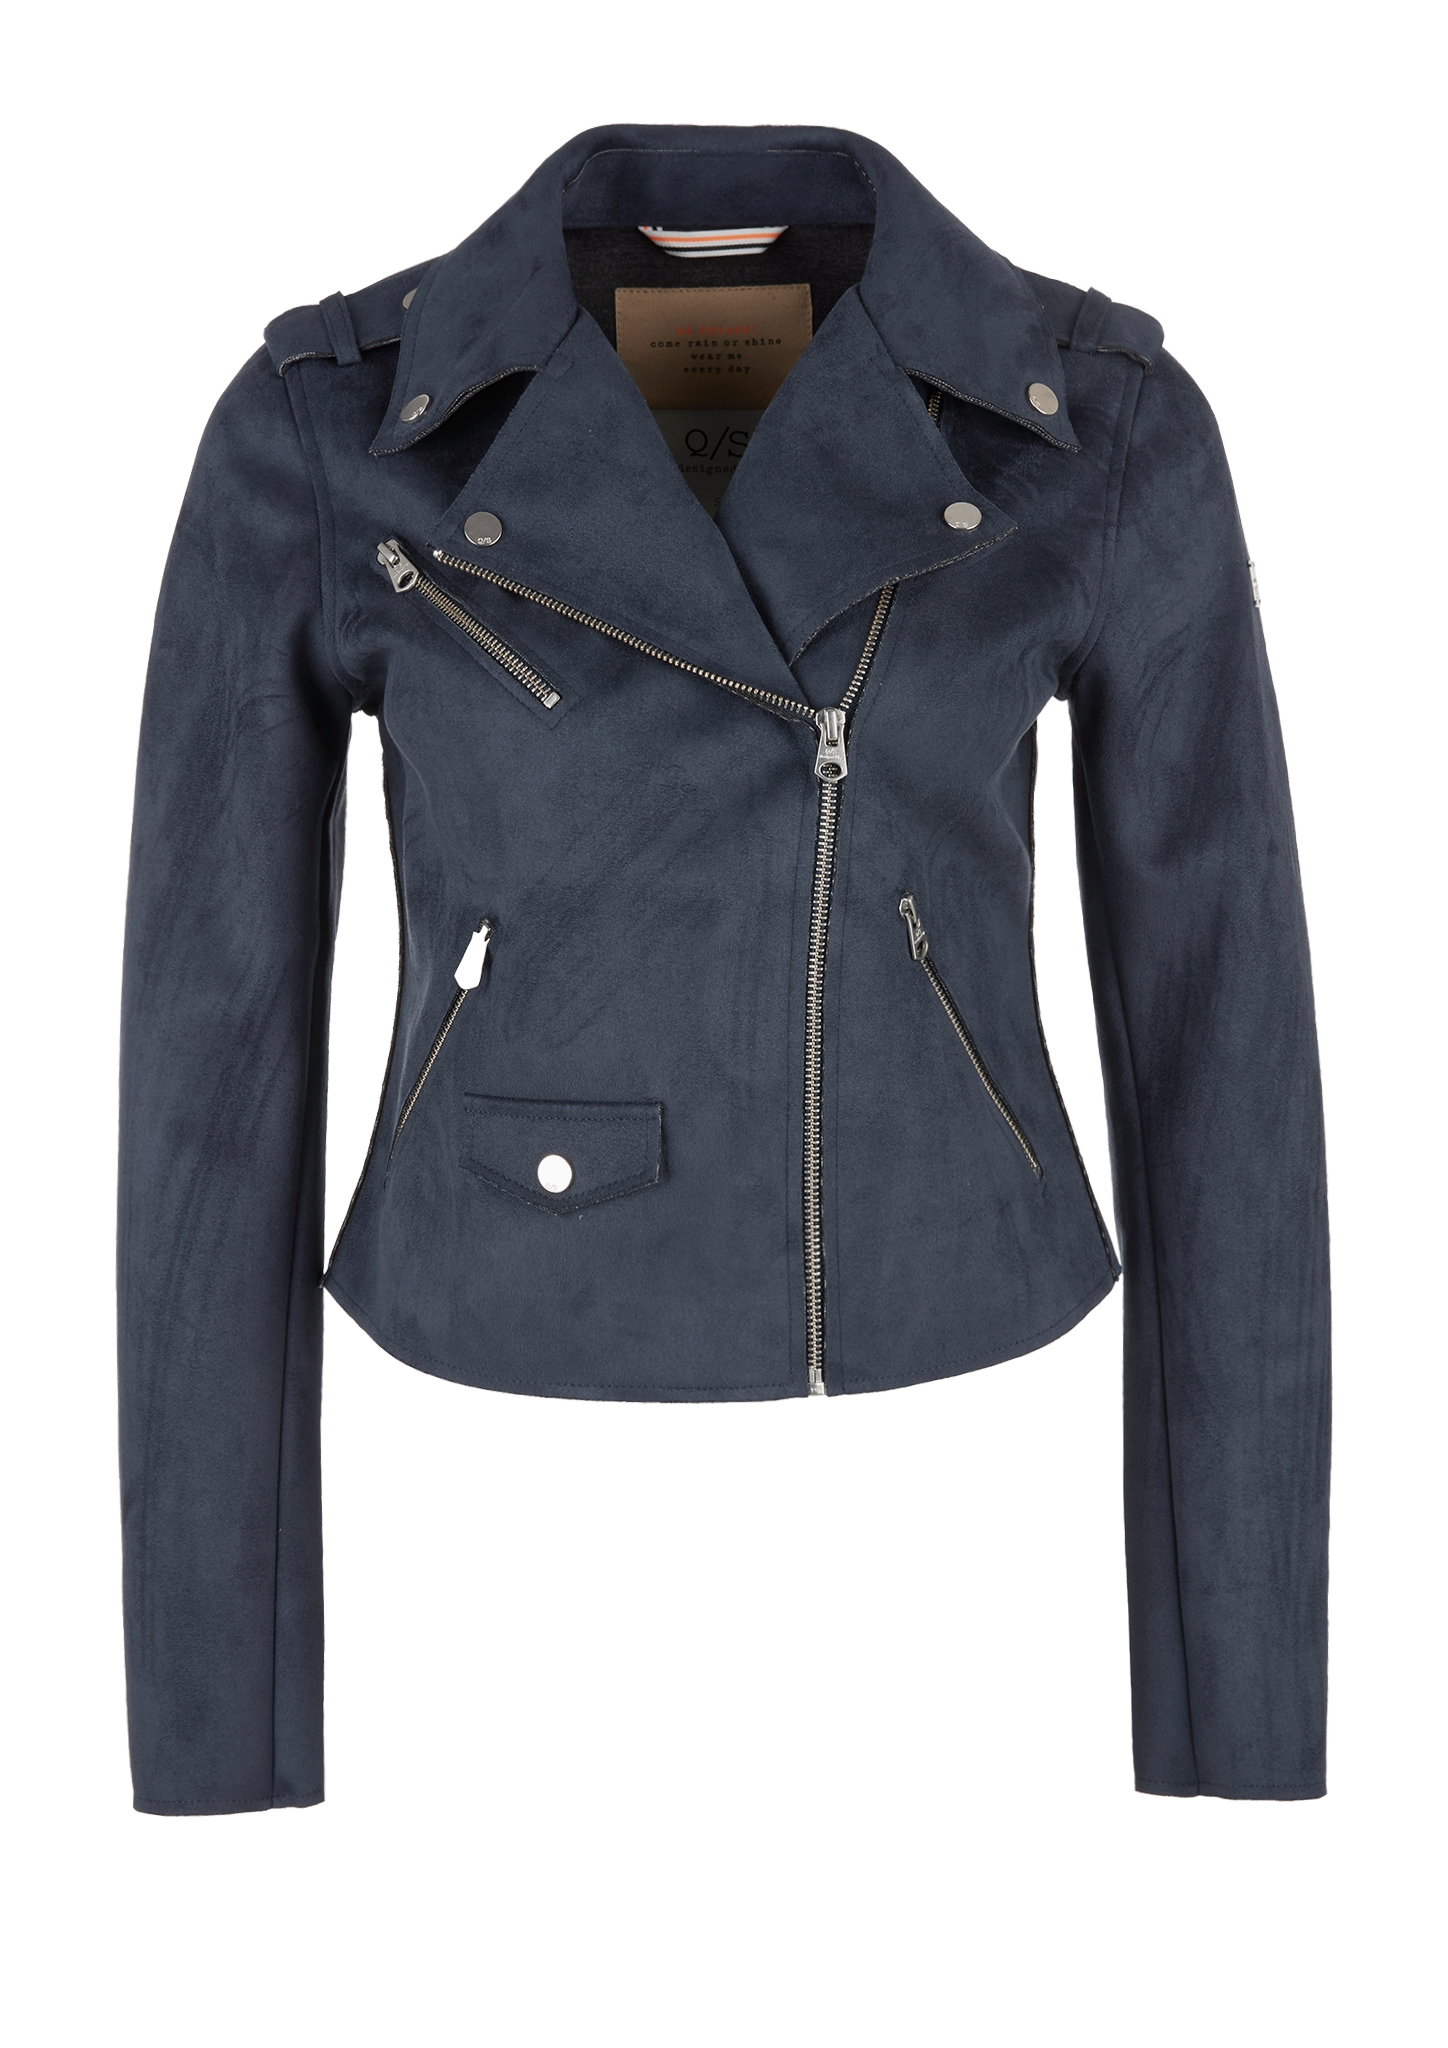 Bikerjacke   Bekleidung > Jacken > Bikerjacken   Q/S designed by